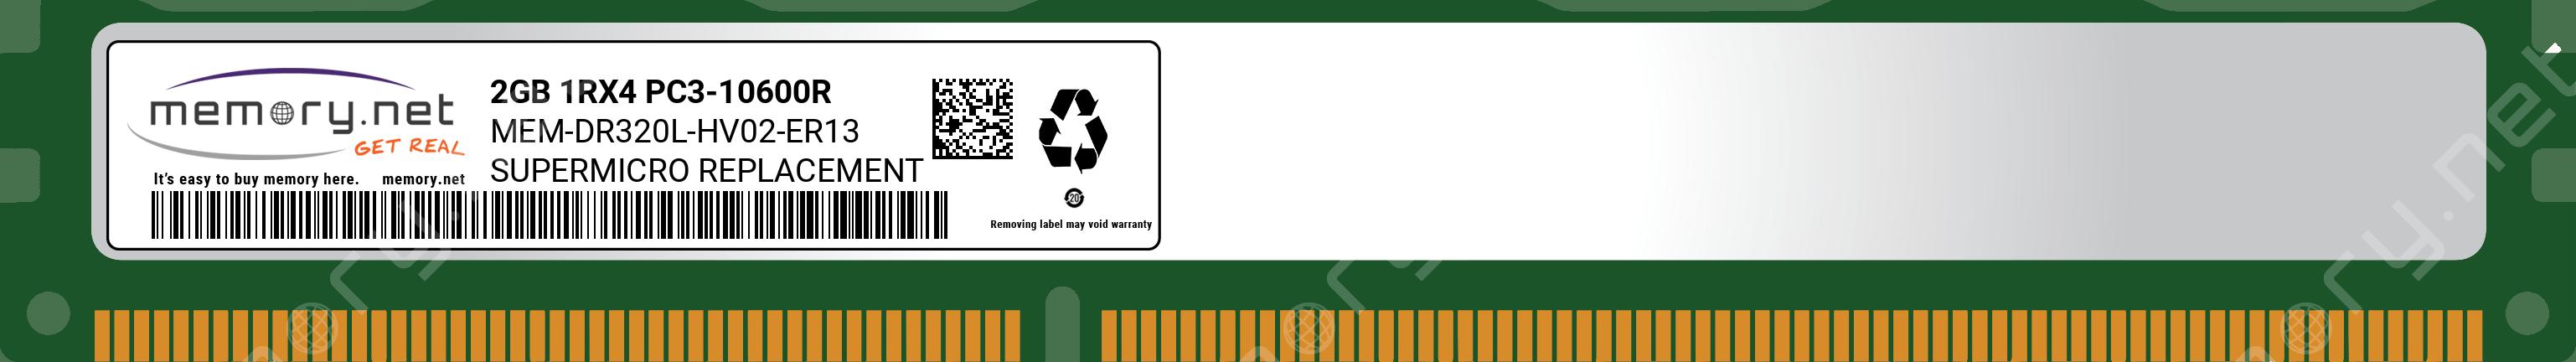 MEM-DR320L-HV02-ER13